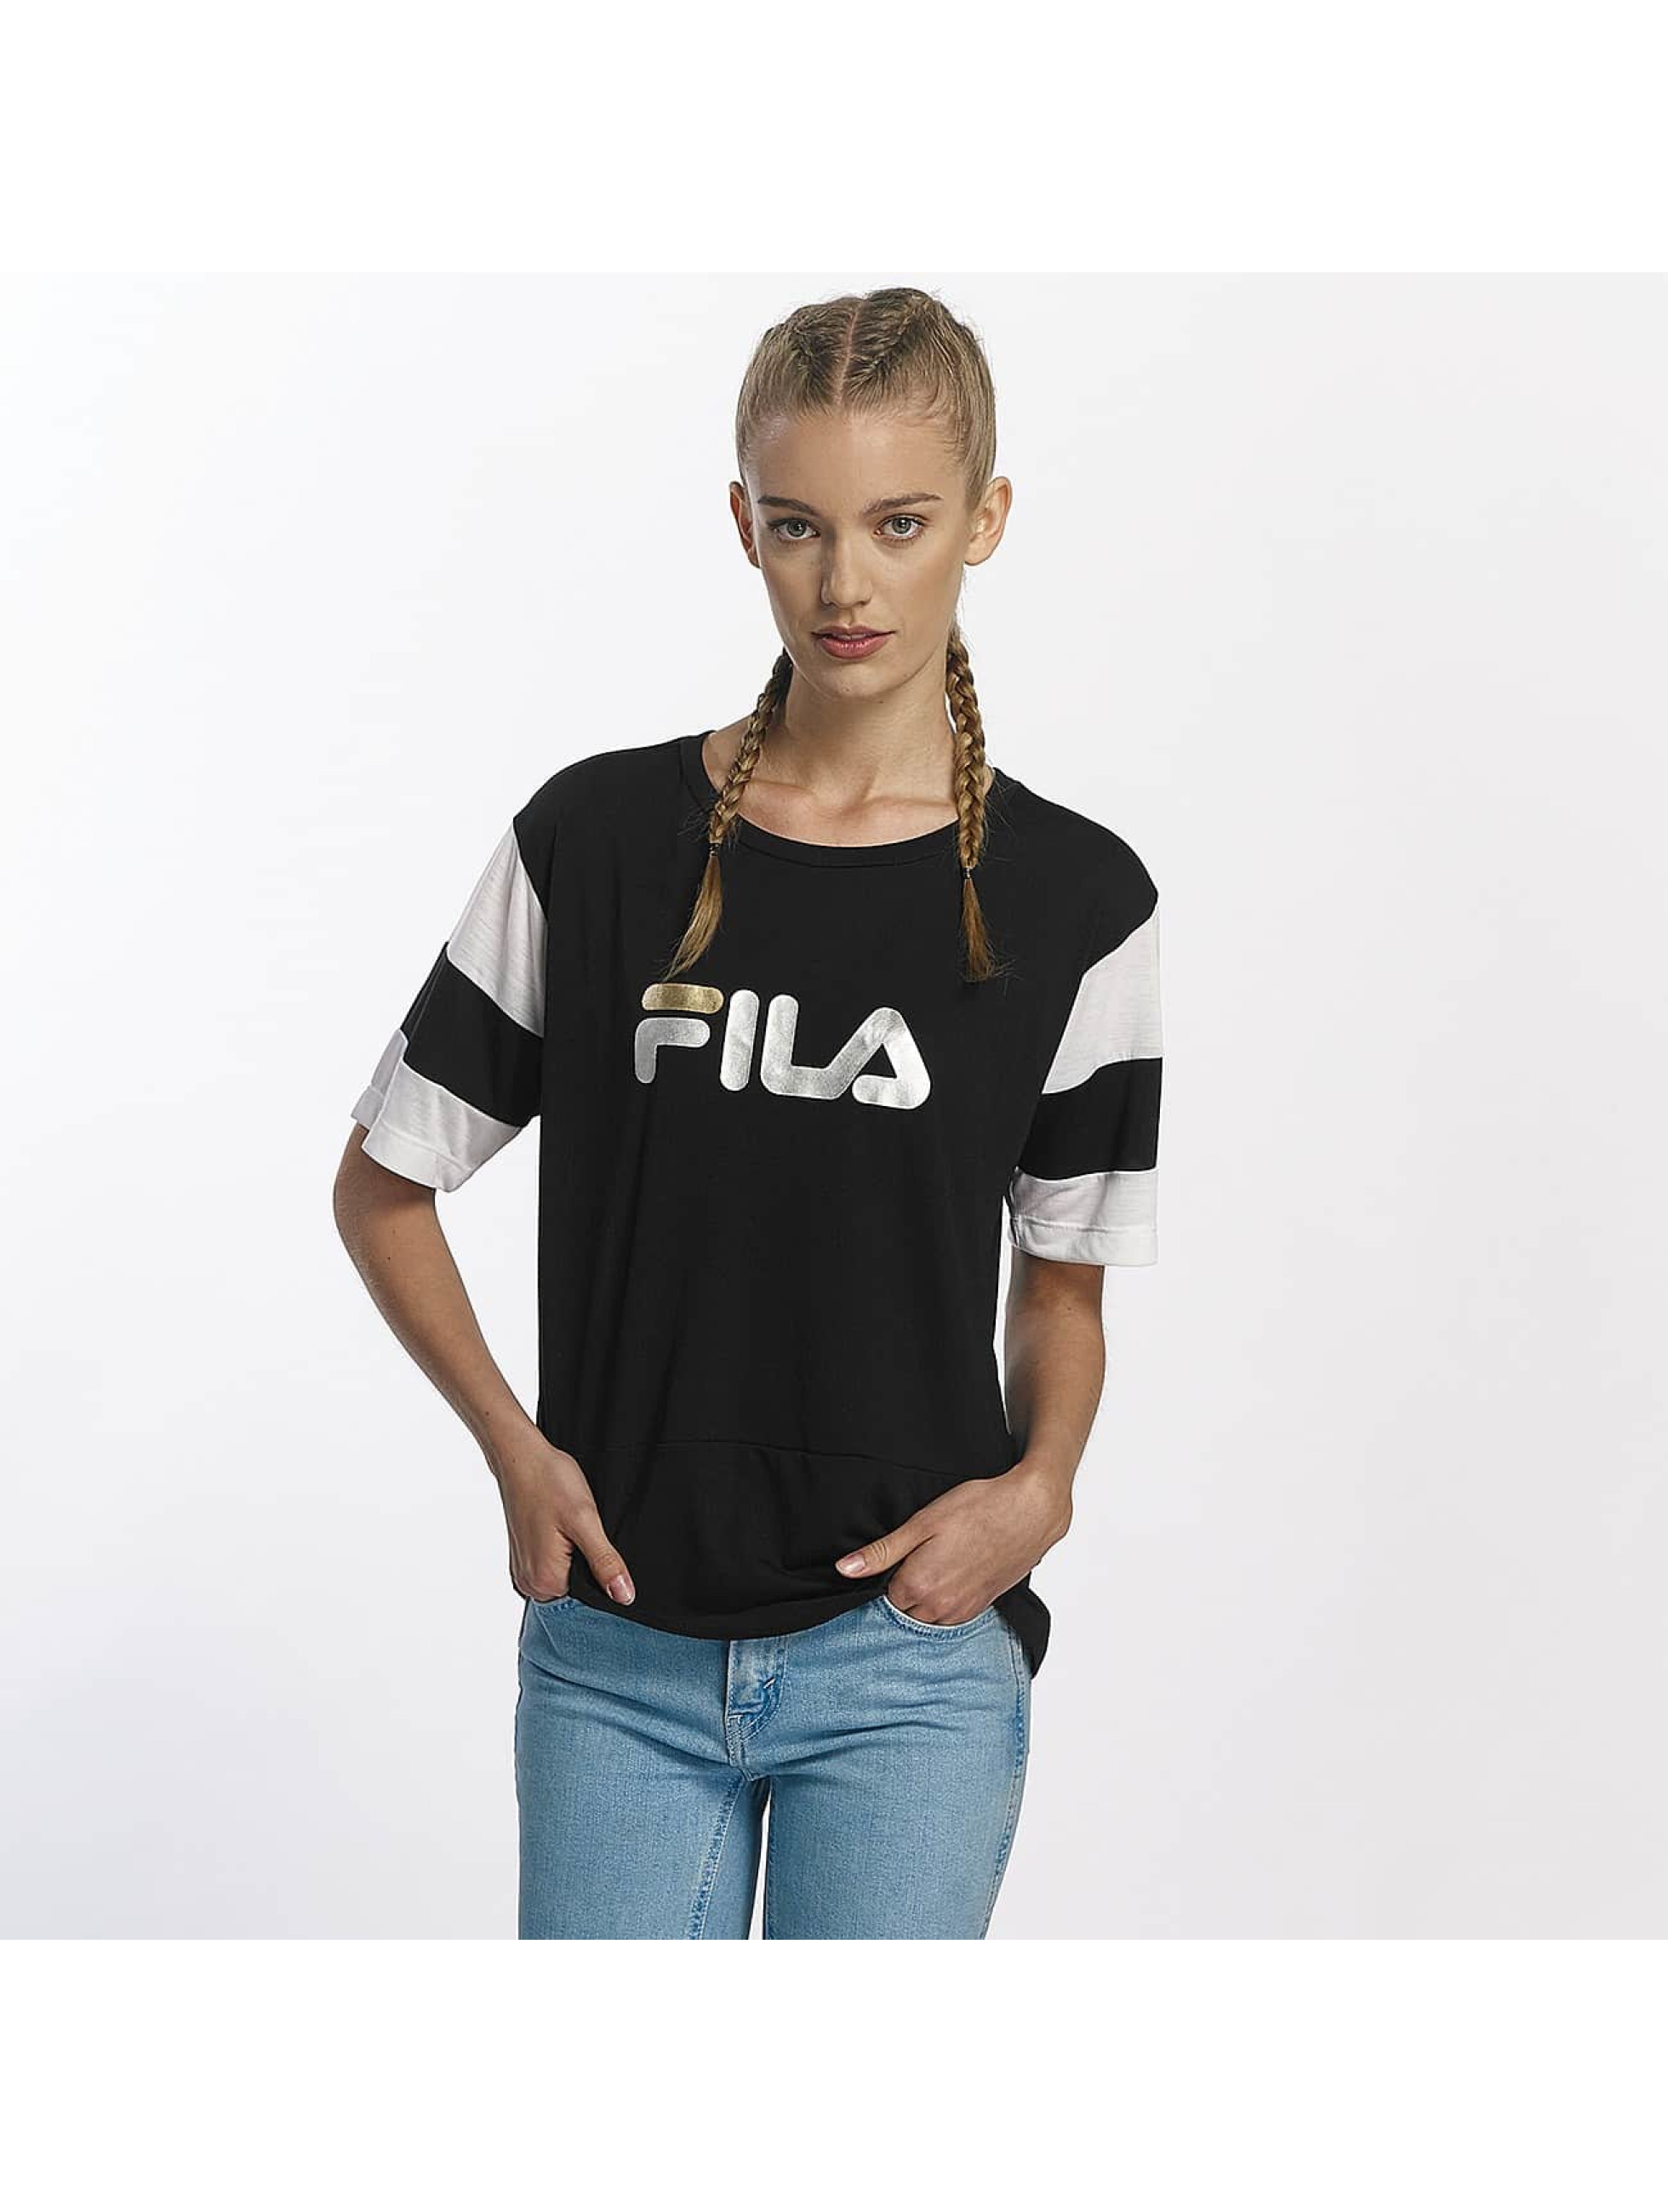 FILA T-paidat Petite Isao Blocked musta